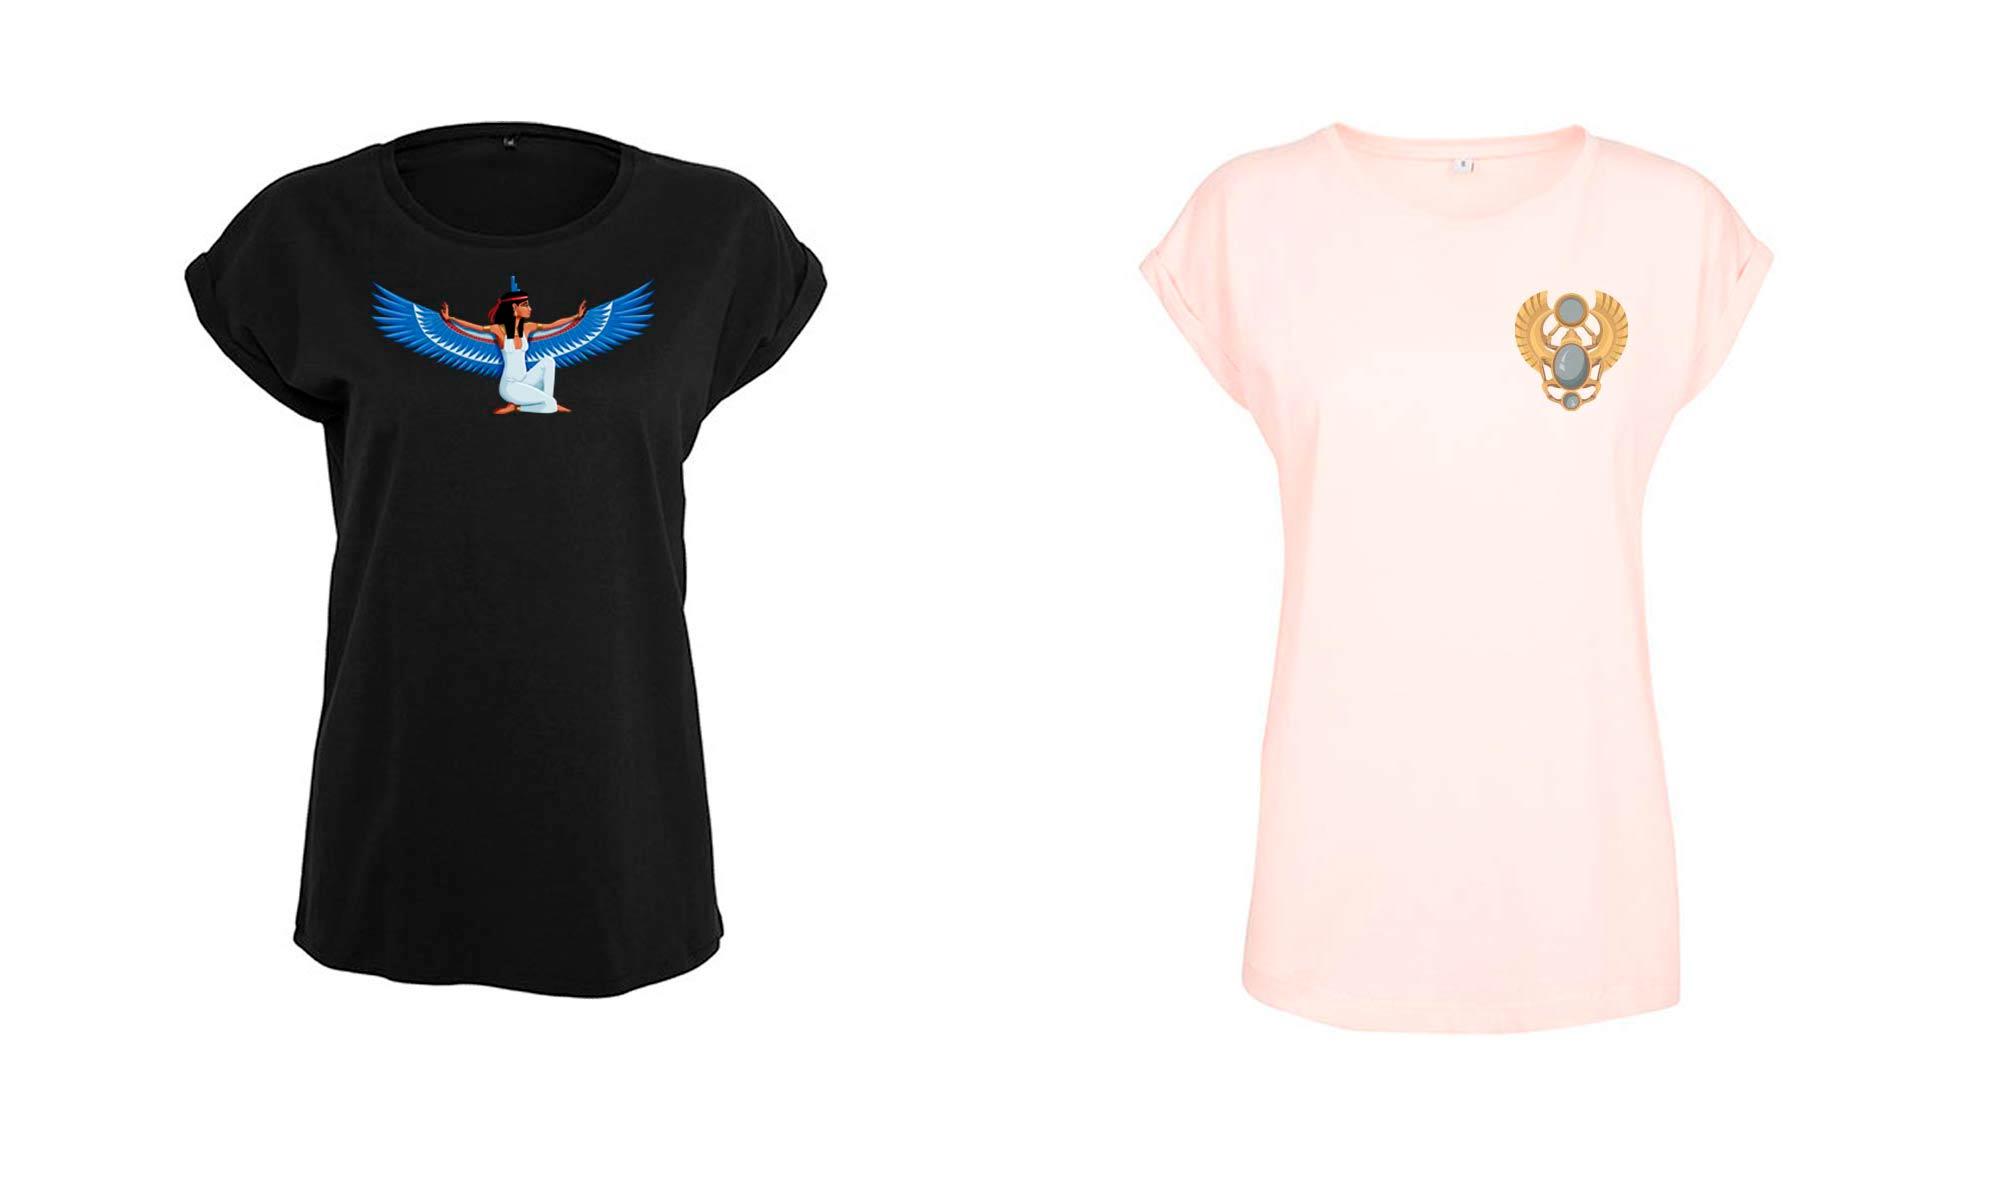 Neue Motiv-Shirts